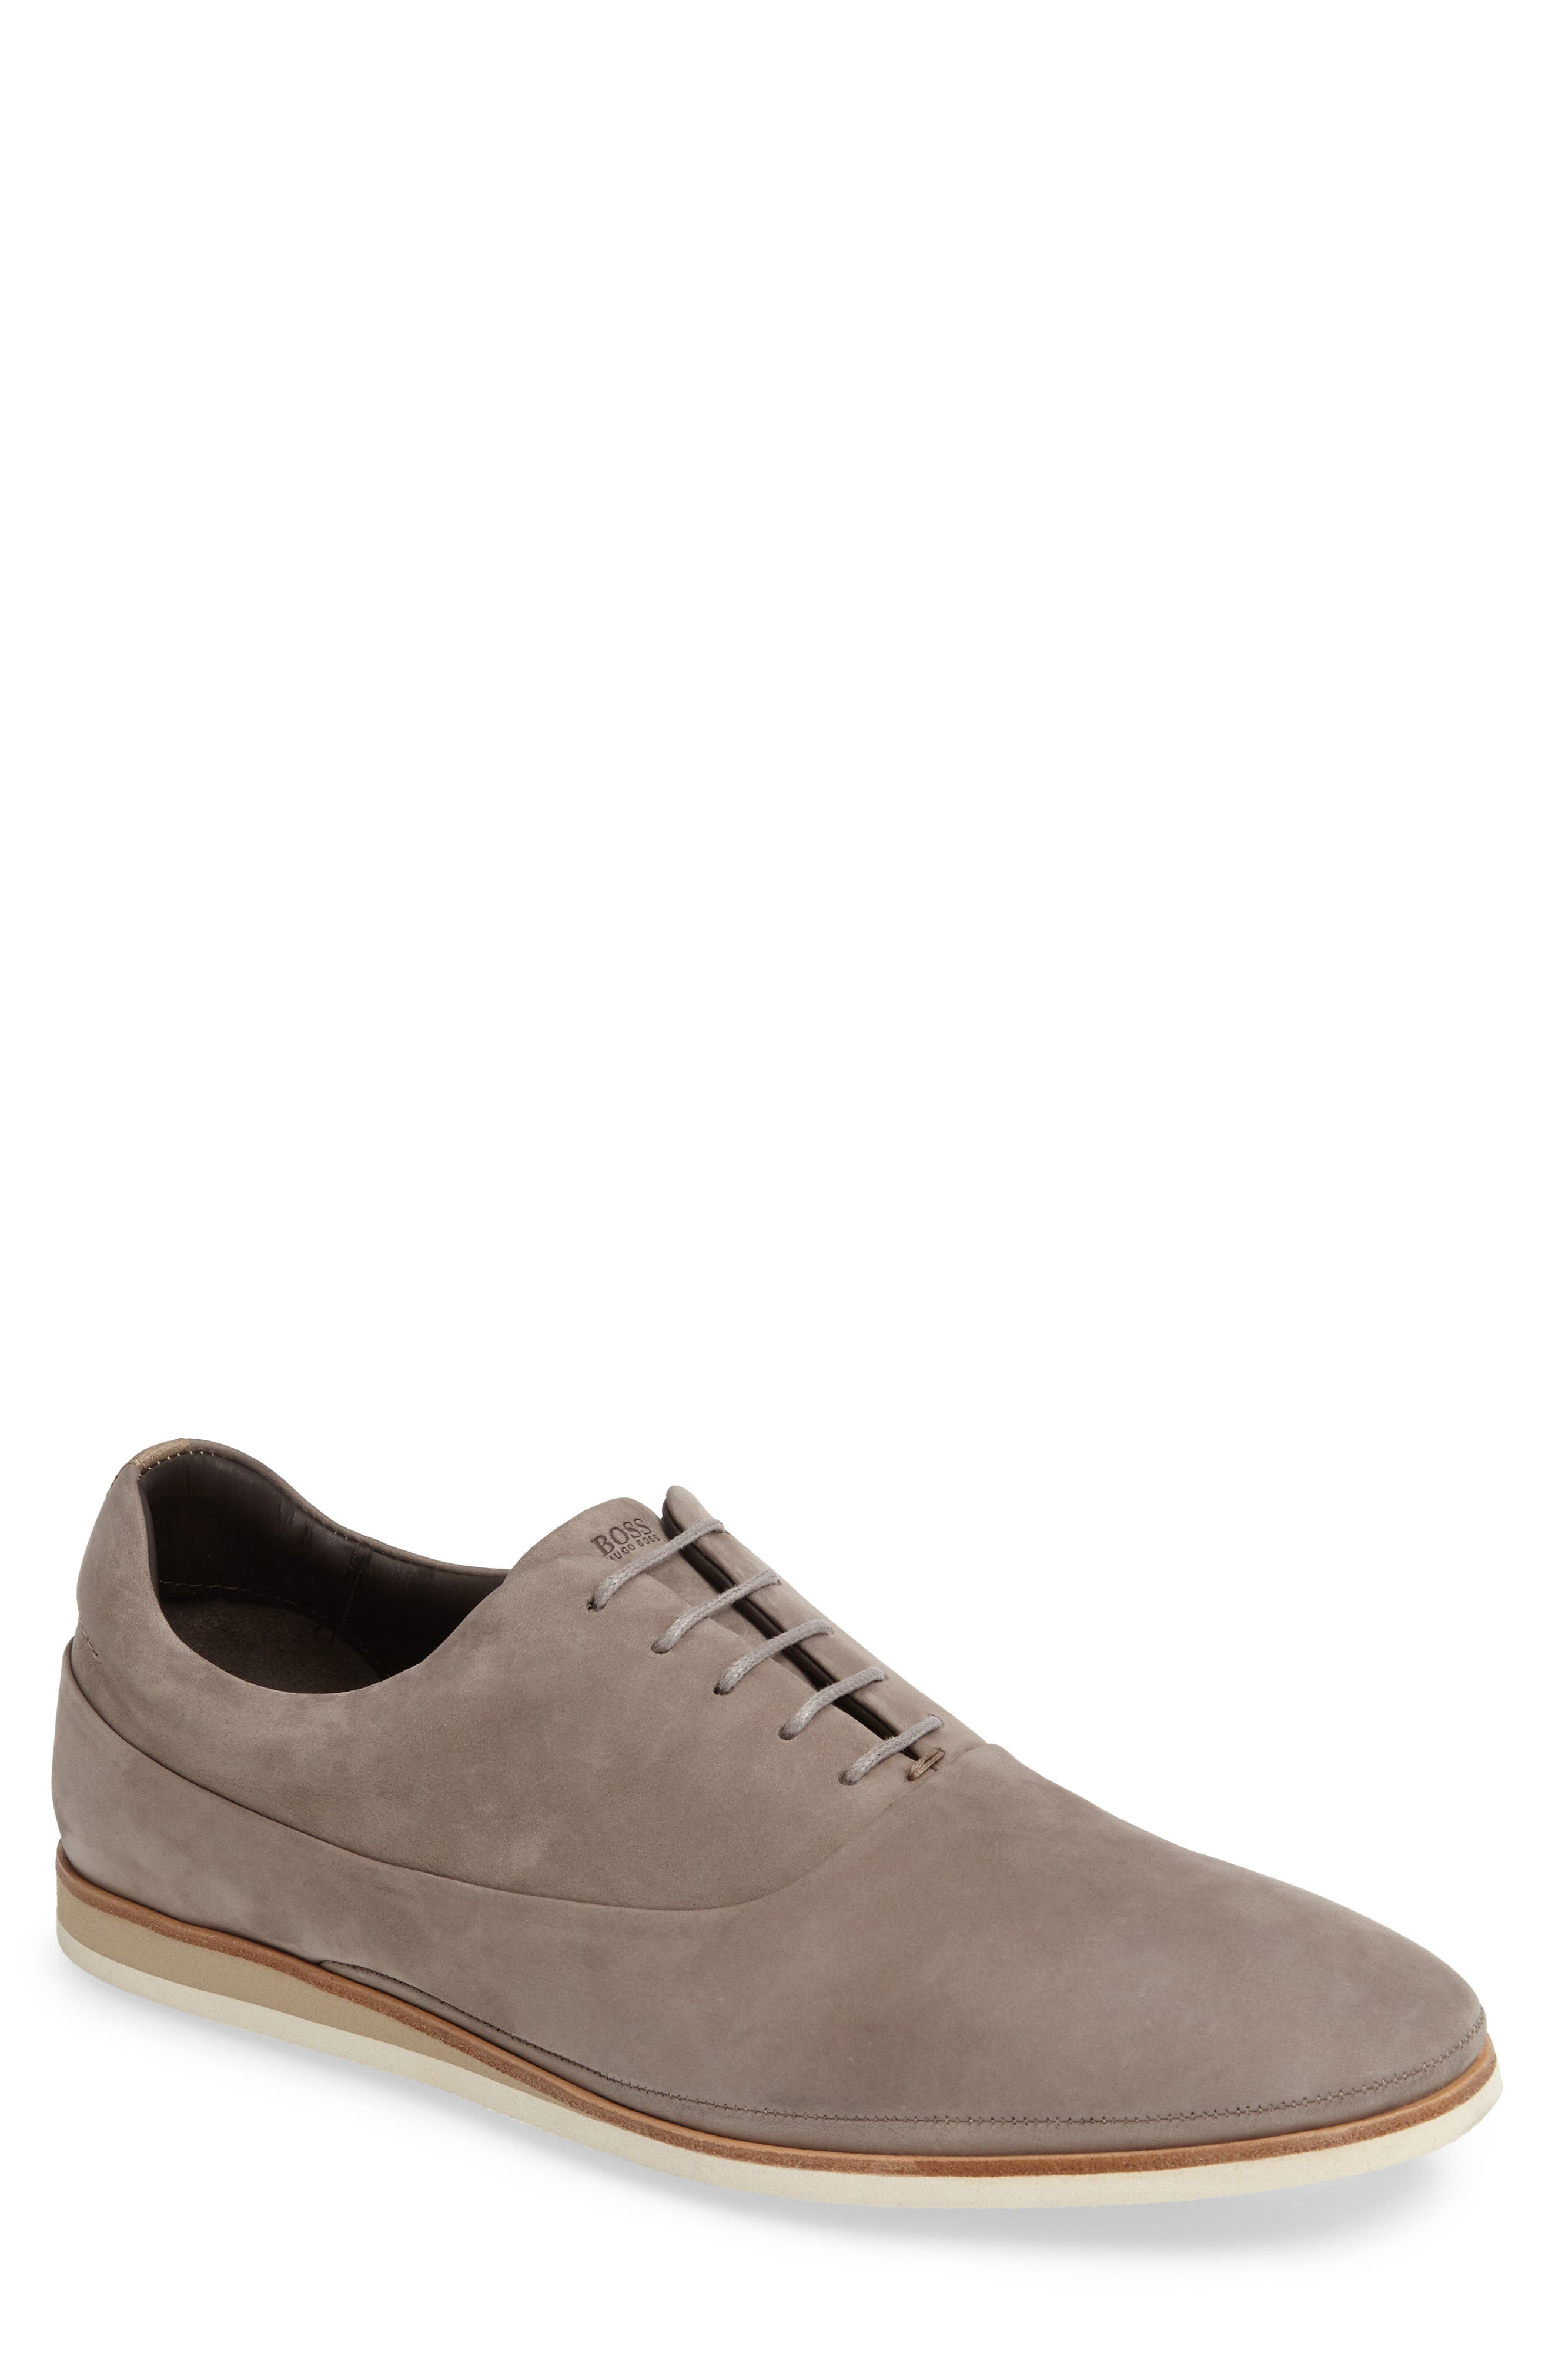 BOSS Eclectic Plain Toe Oxford (Men)